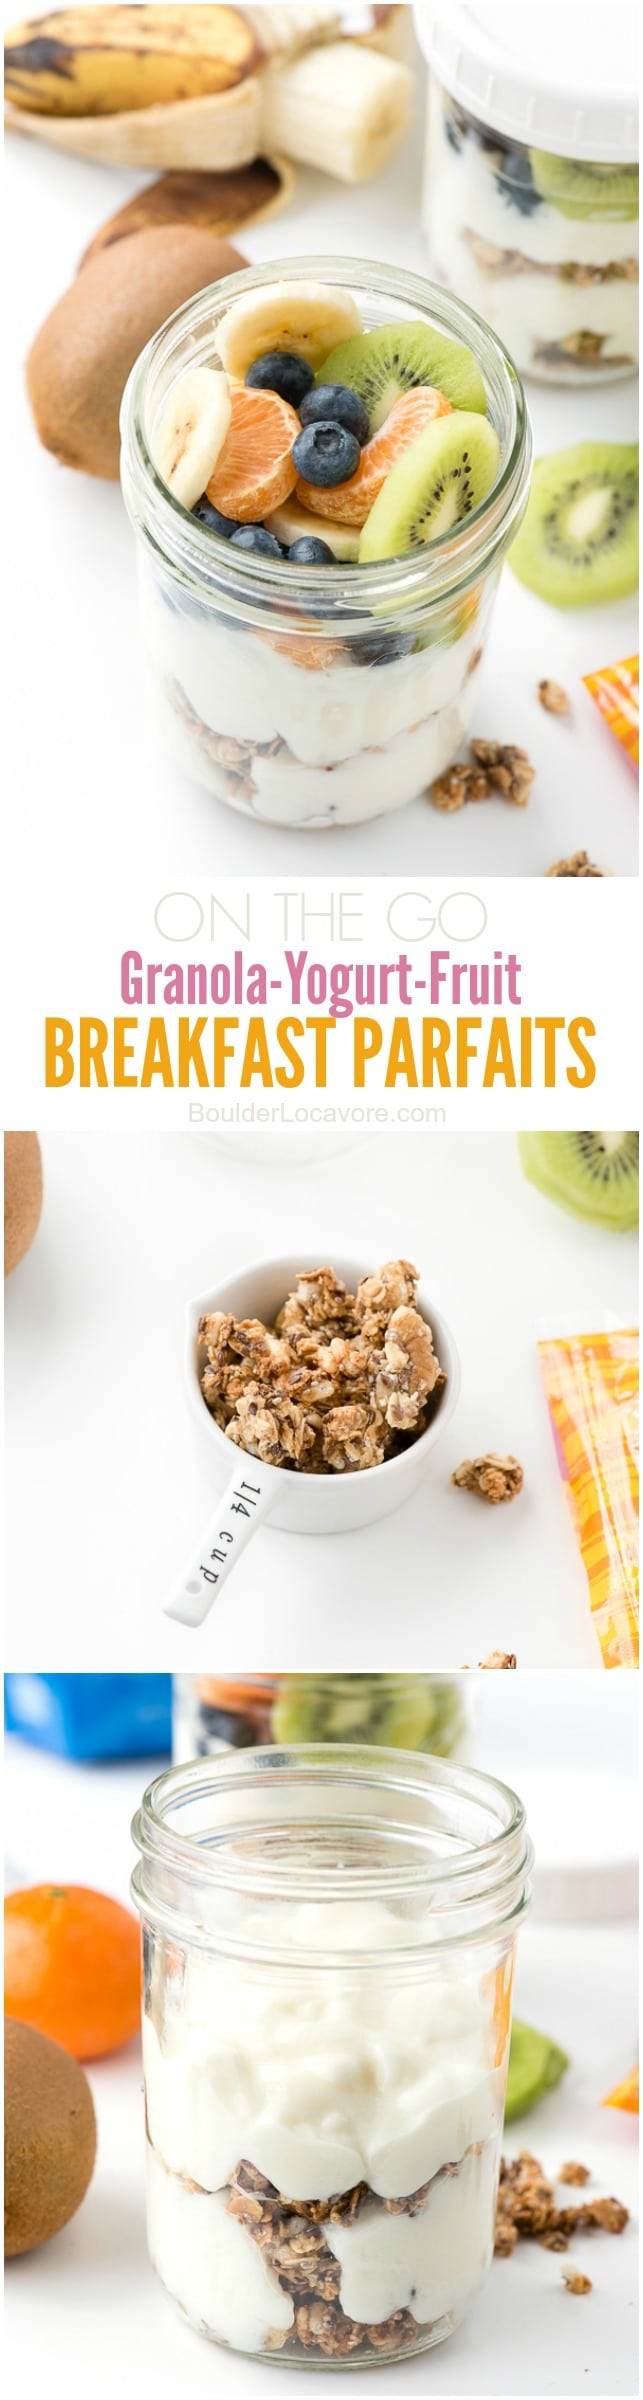 Granola and Yogurt collage